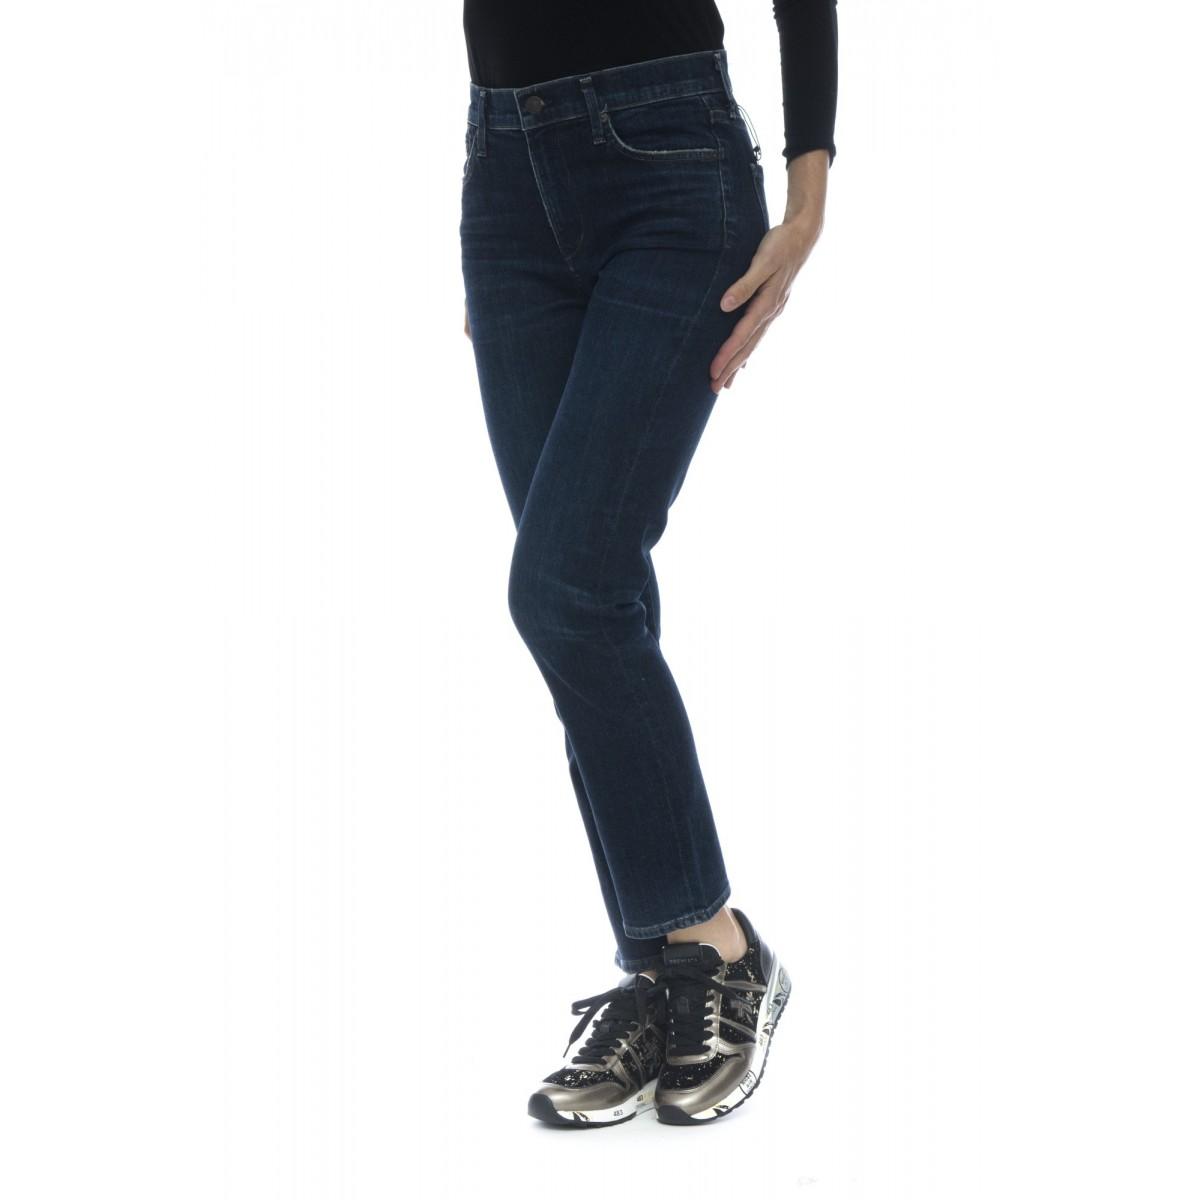 Jeans - Cara maya 1664b-372